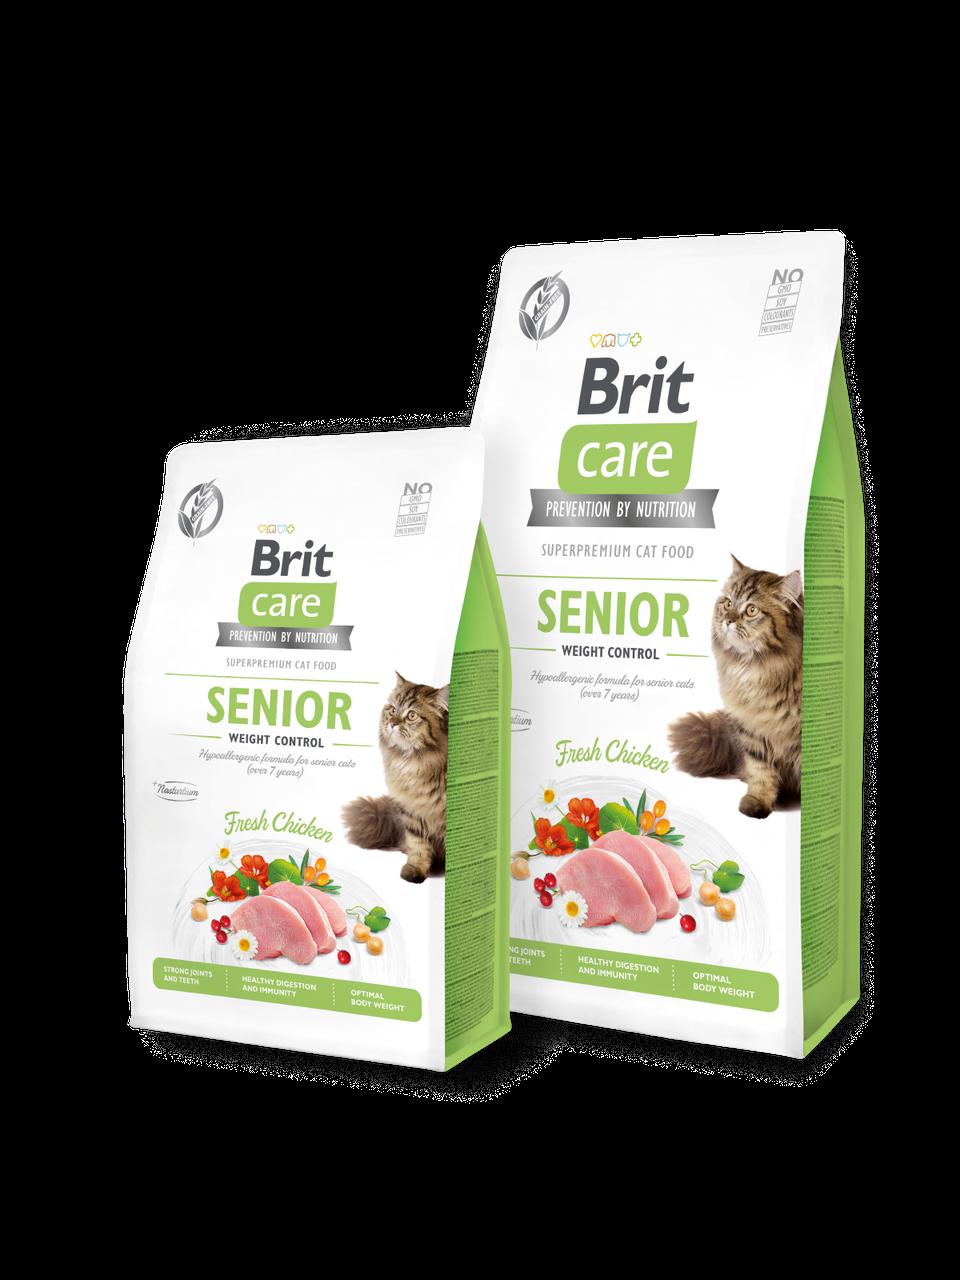 Корм для котов Brit Care Cat Grain-Free SENIOR AND WEIGHT CONTROL 0.4кг